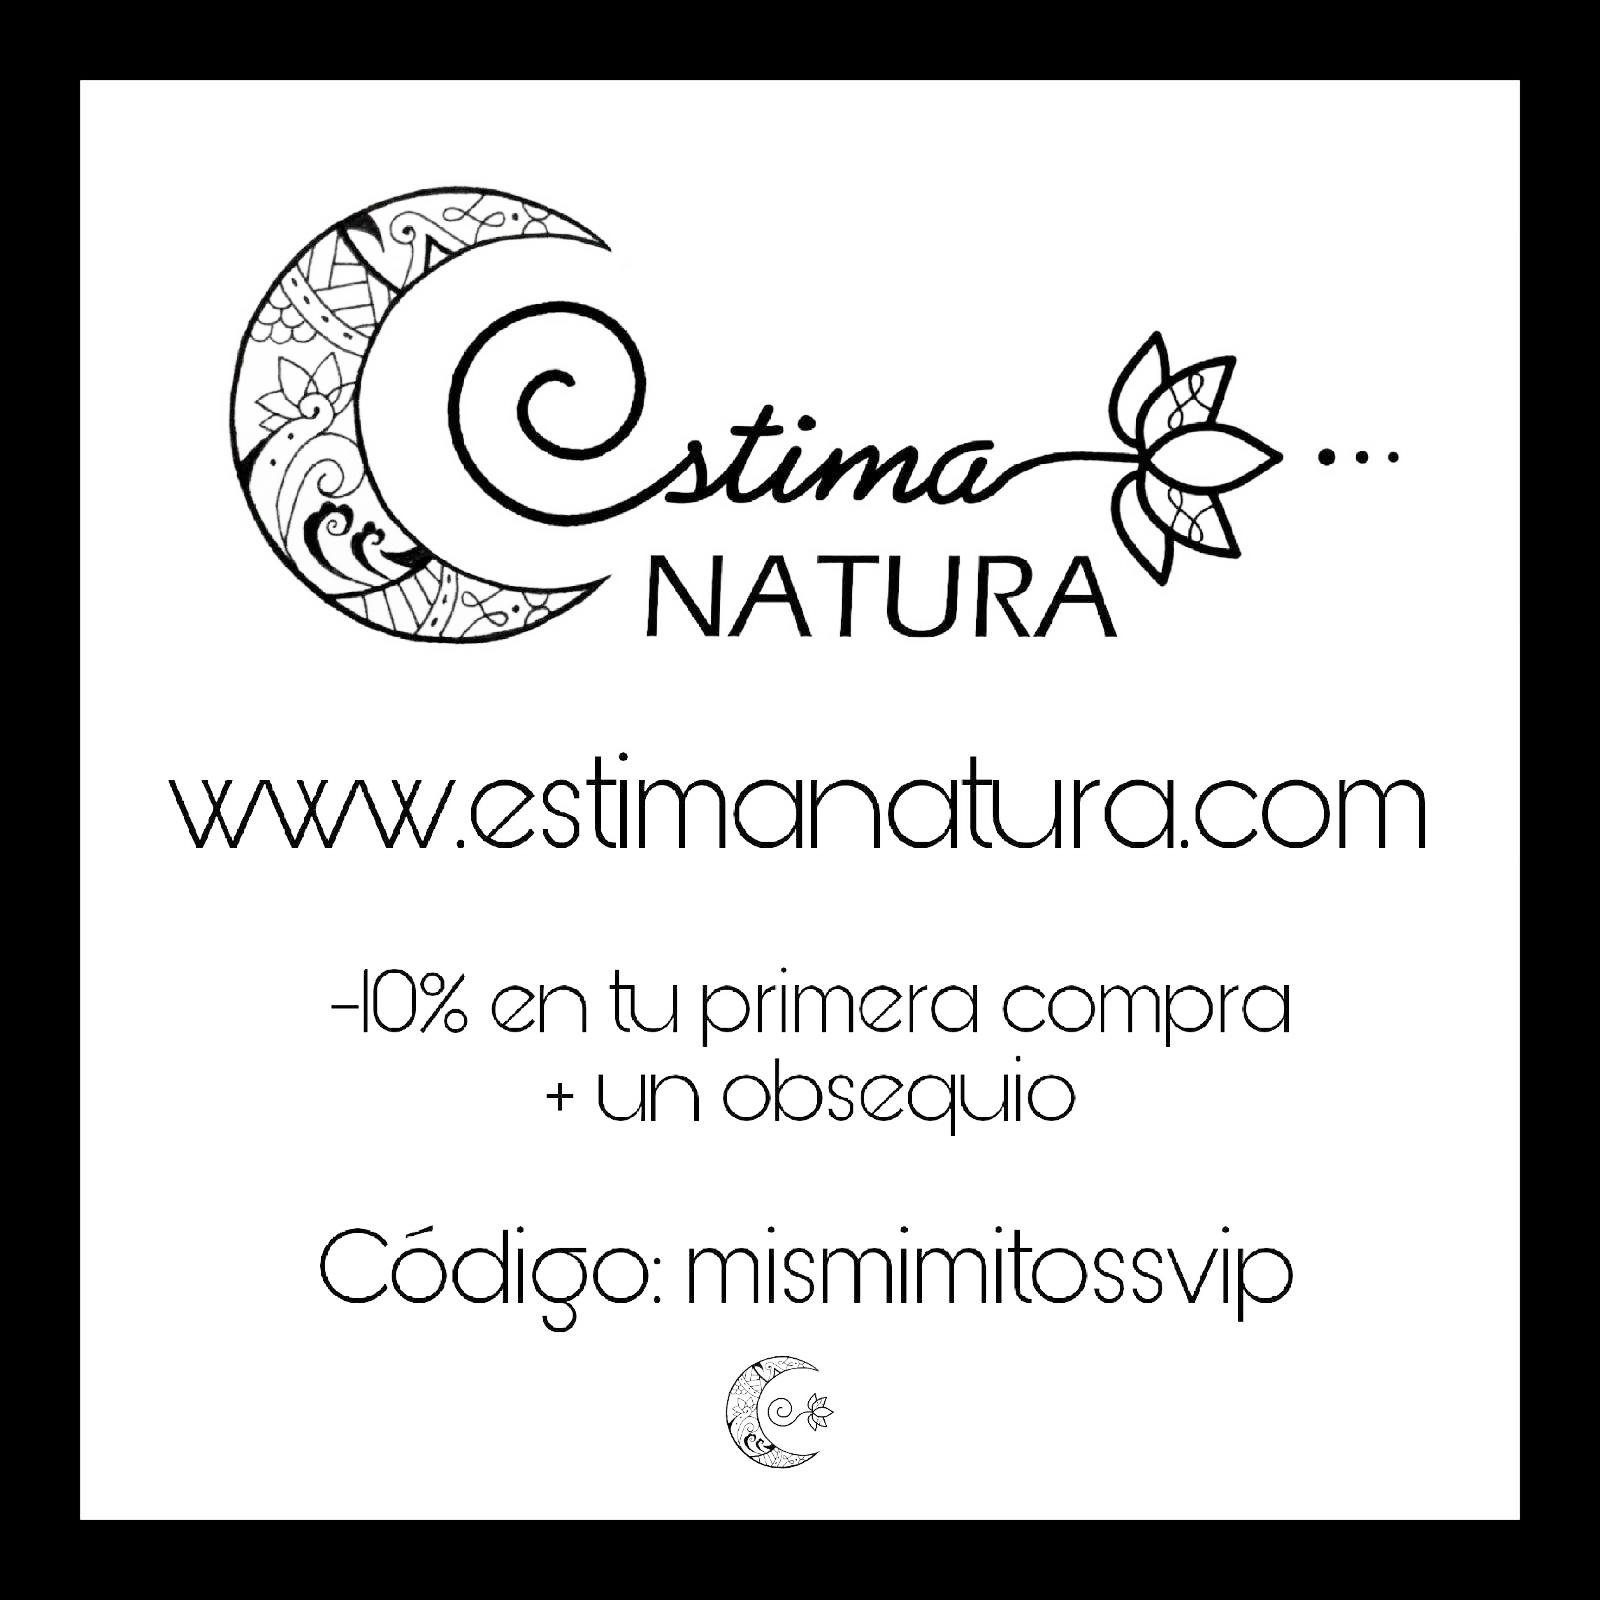 Estima Natura